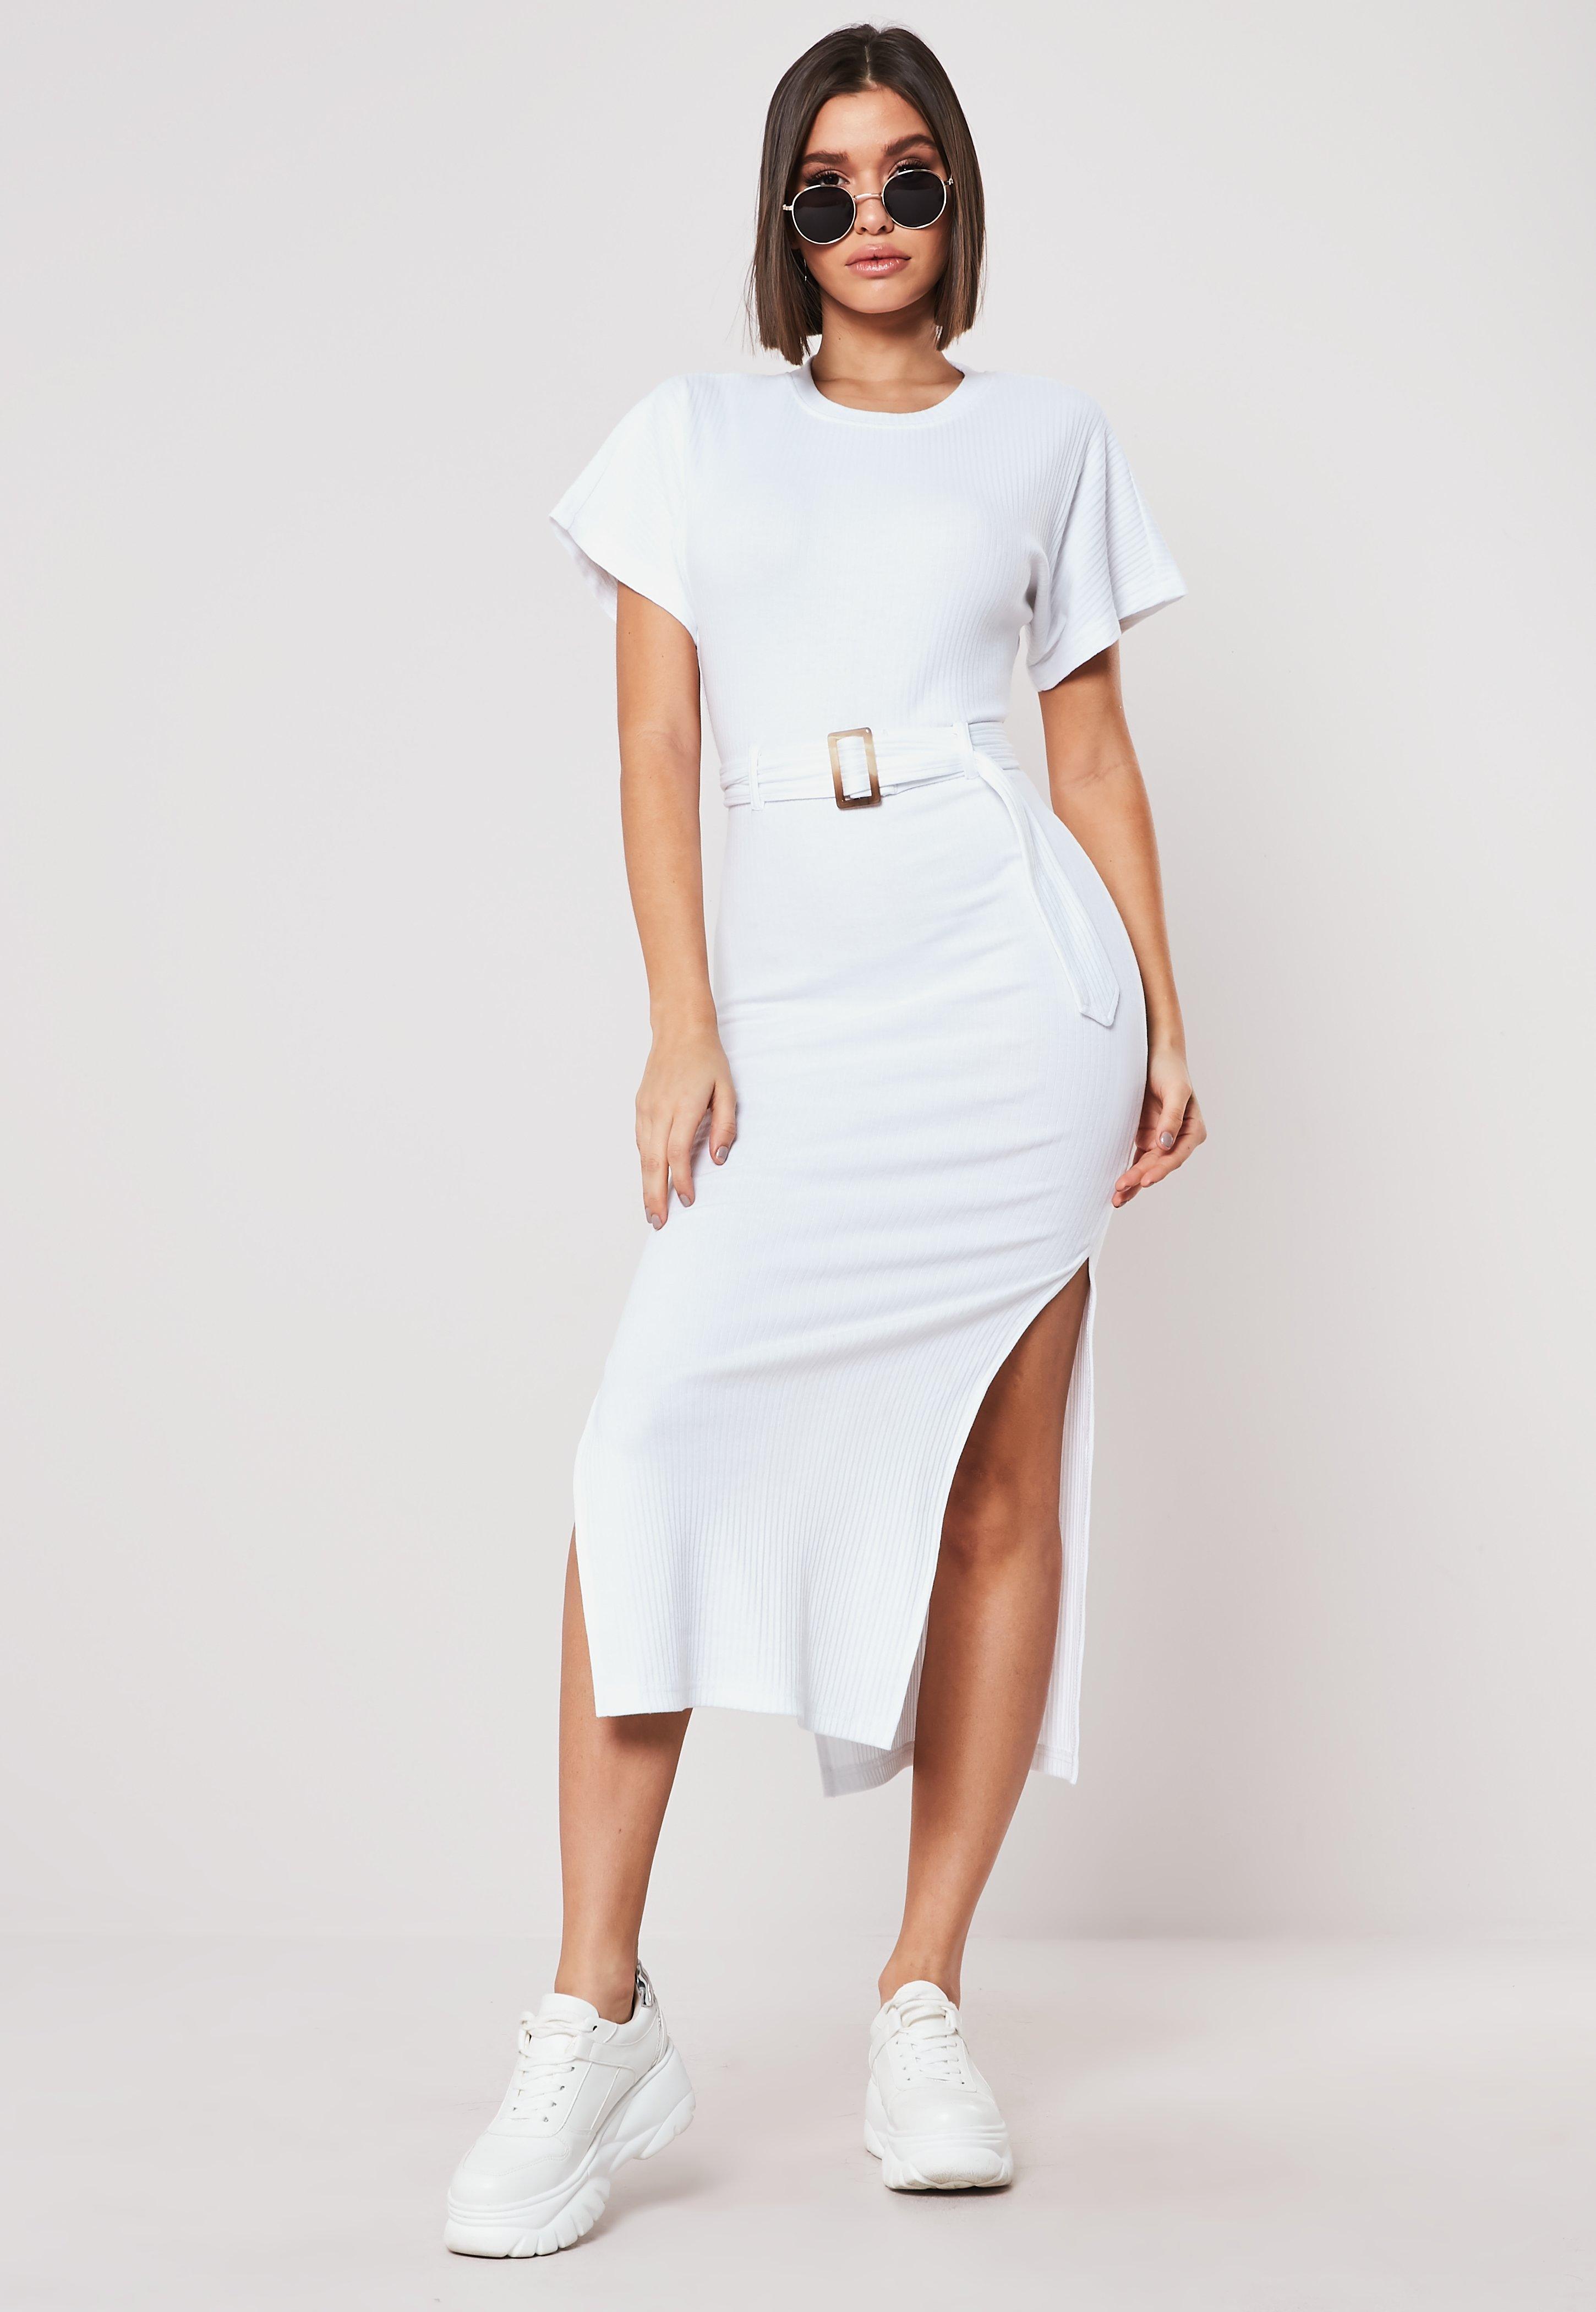 b3e6c1201c Robe blanche | Achat robe blanche femme - Missguided